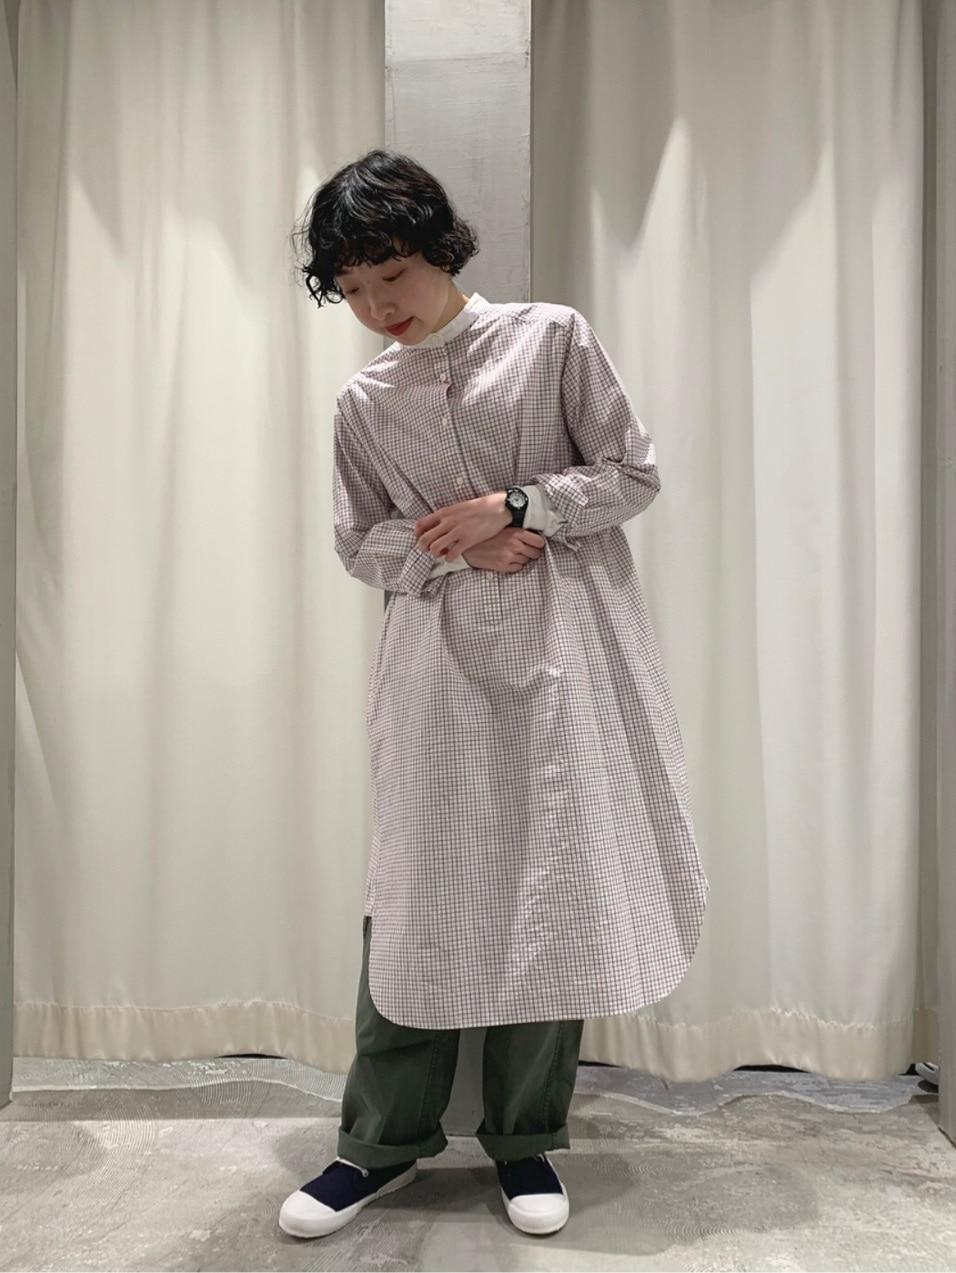 - CHILD WOMAN CHILD WOMAN , PAR ICI ルミネ横浜 身長:157cm 2021.01.12